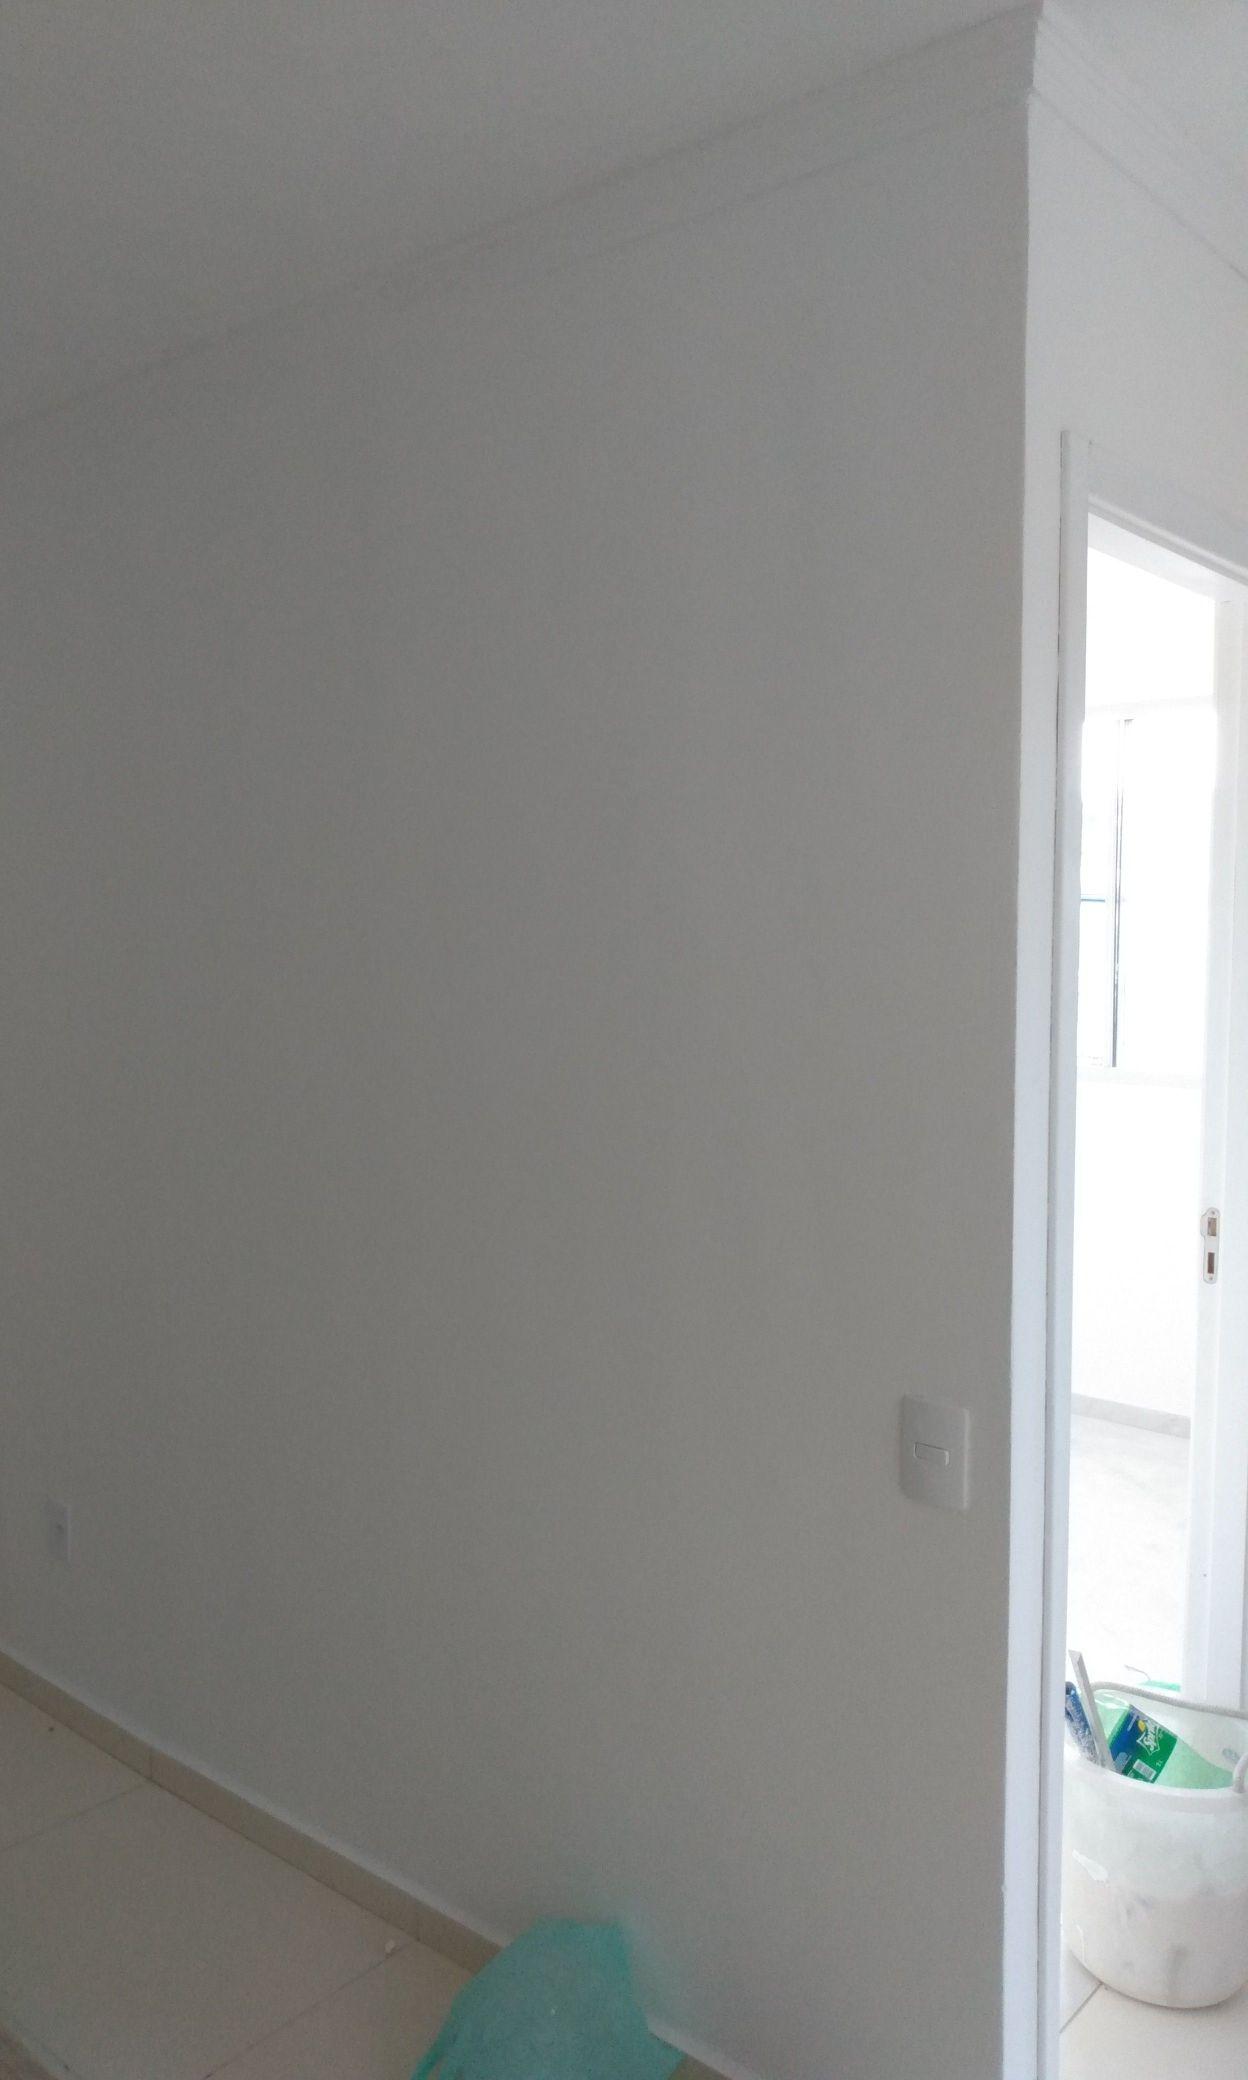 pintura em branco